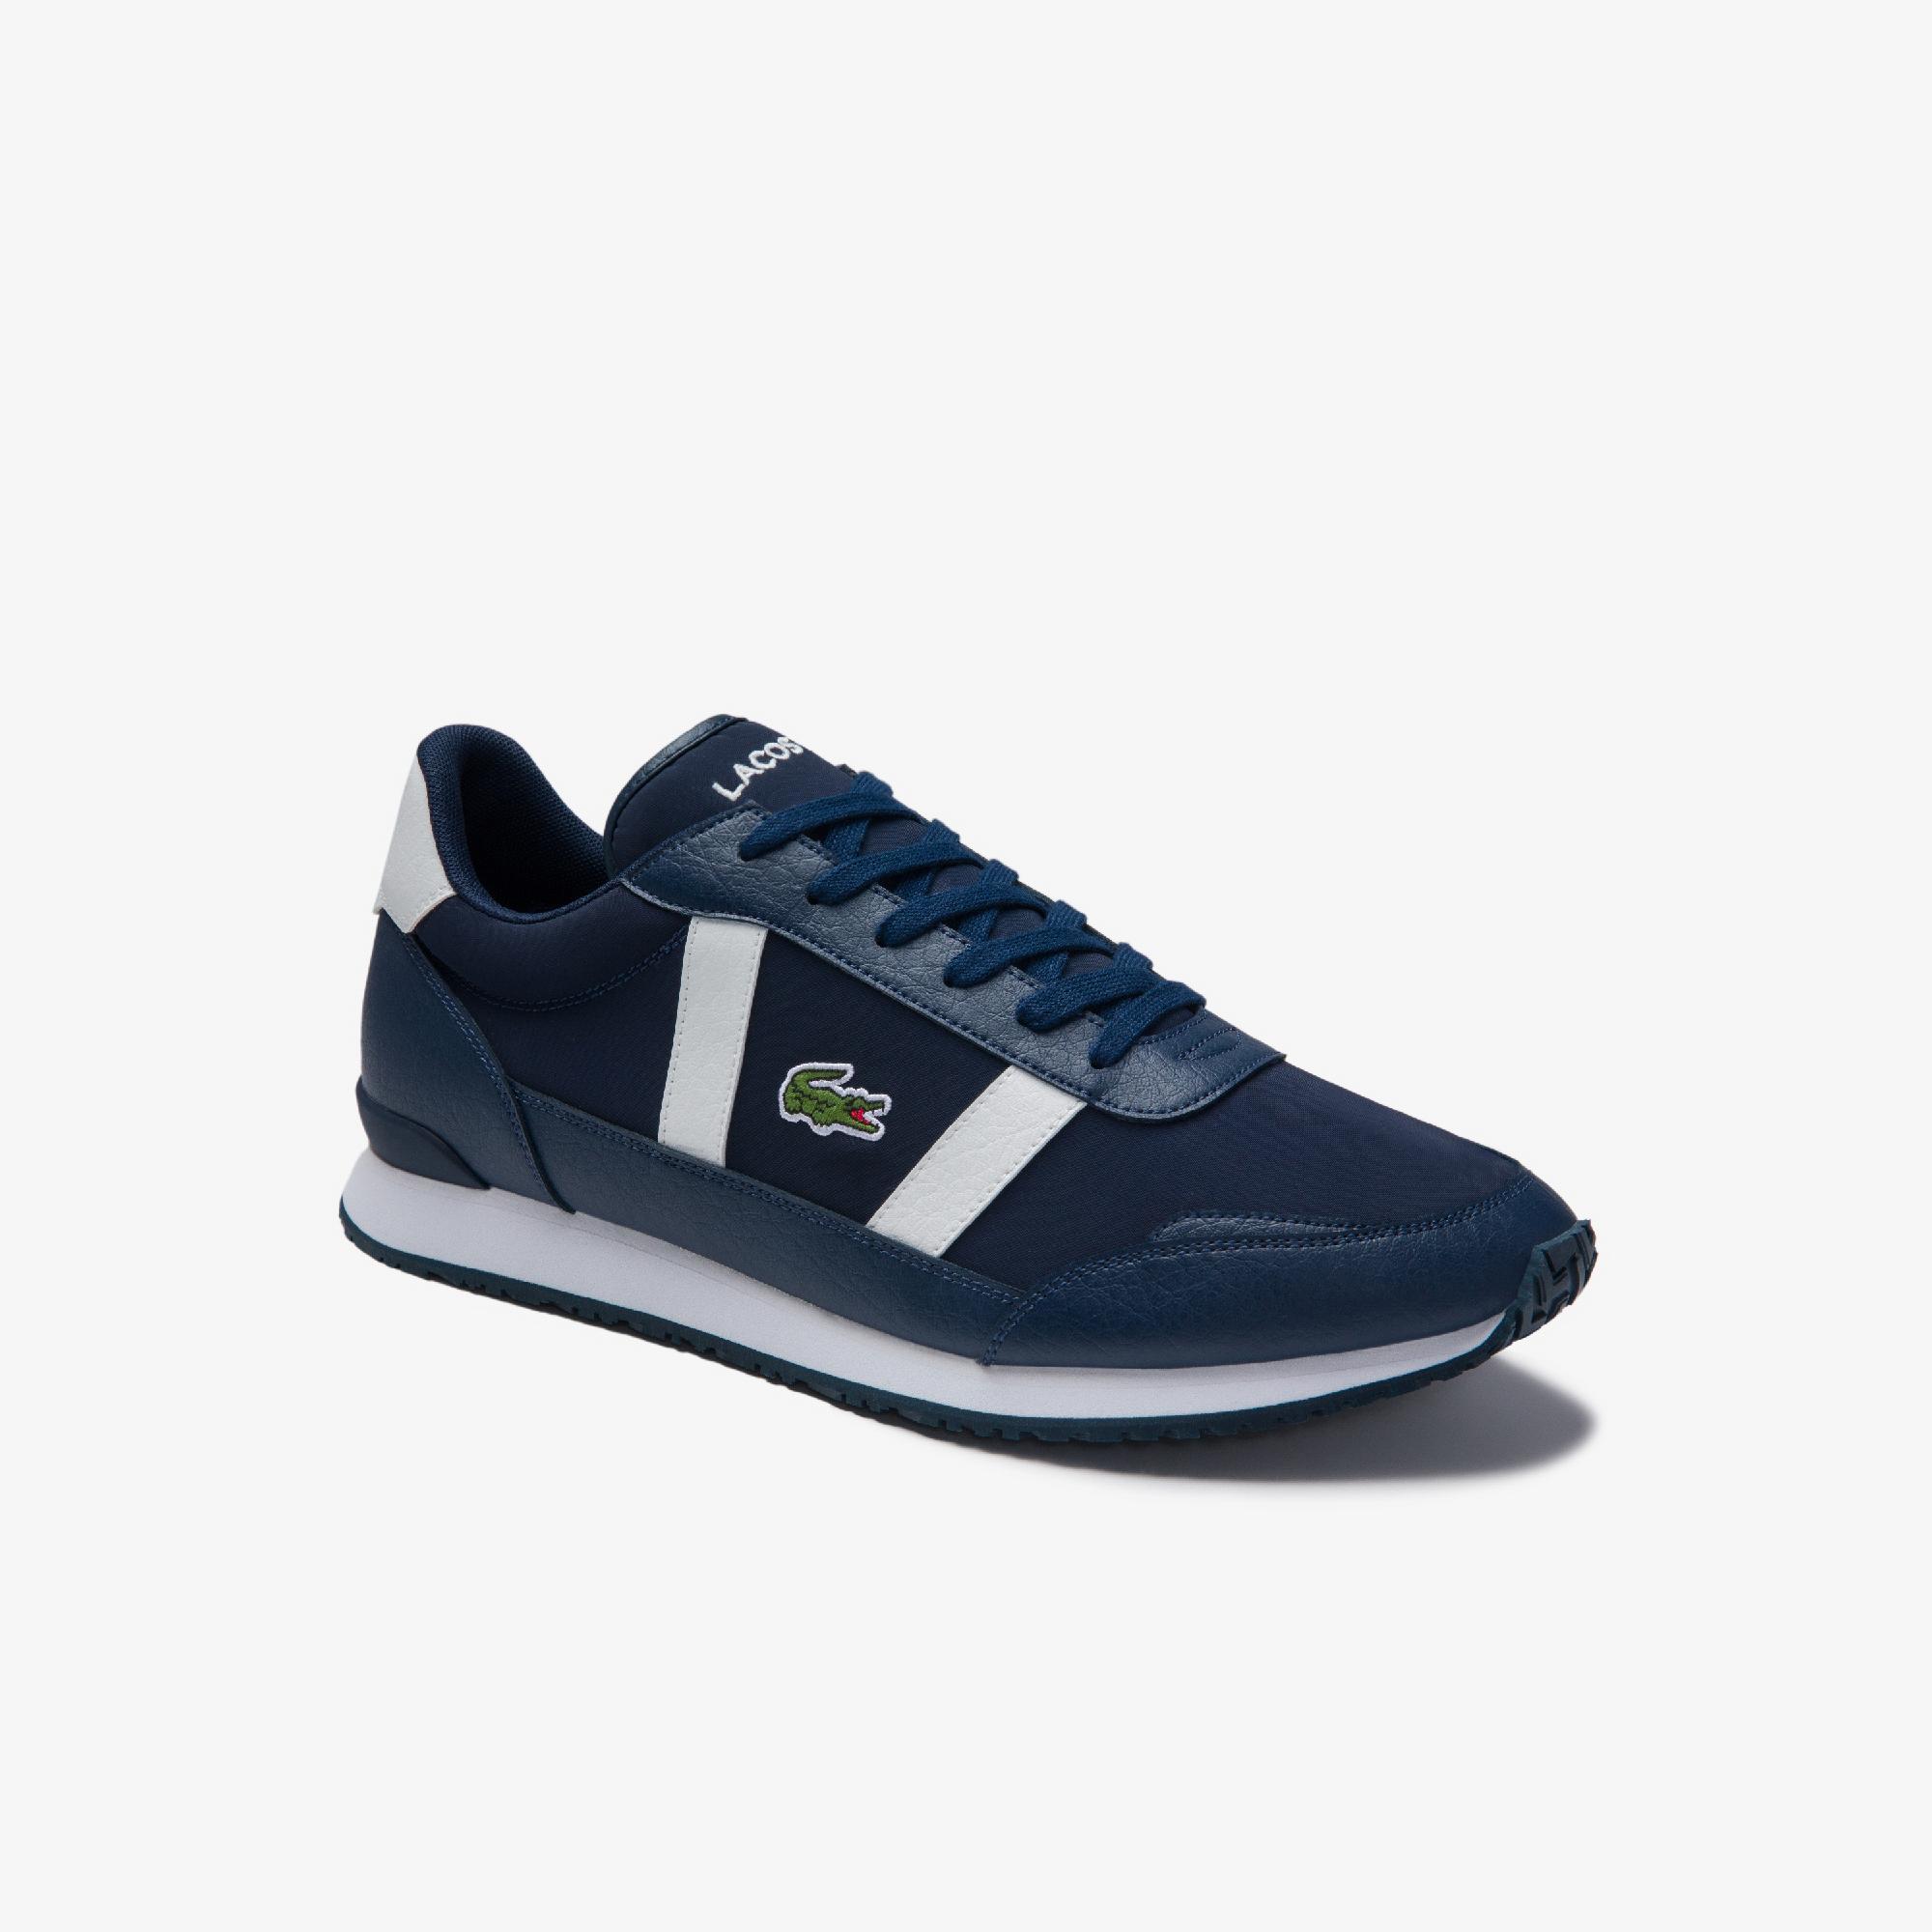 Lacoste Partner 0120 1 Sma Erkek Lacivert - Beyaz Sneaker